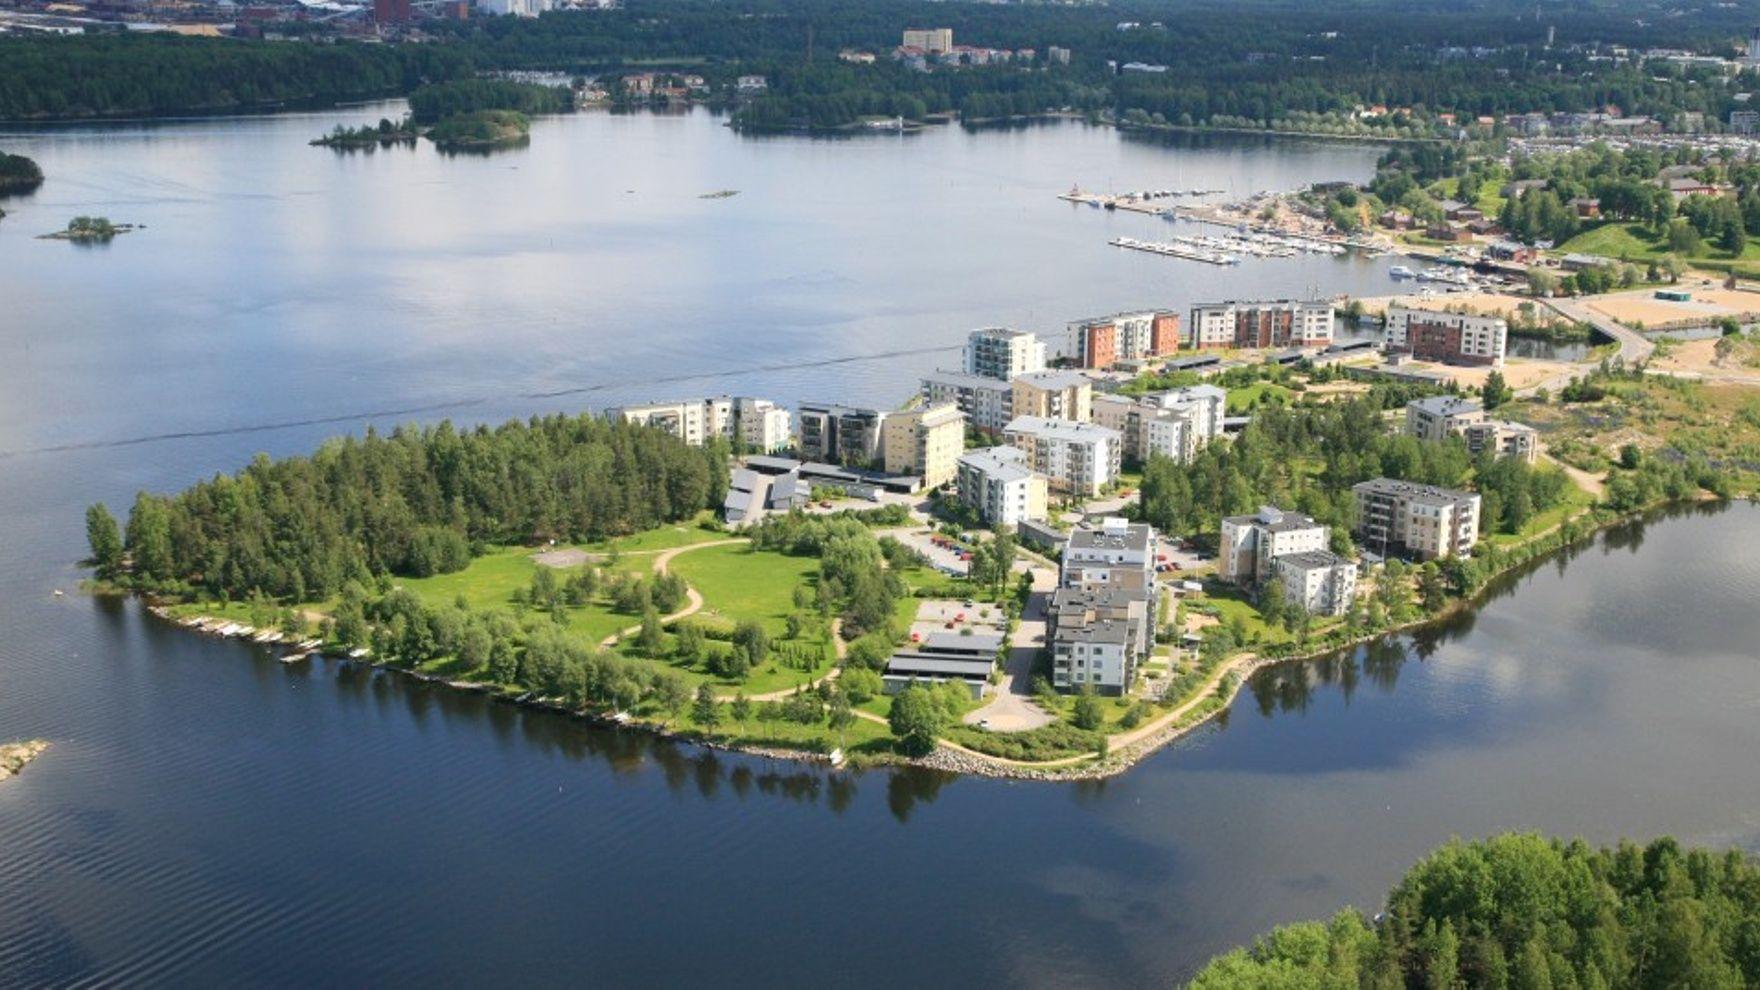 Mile building: Saimaa lakes